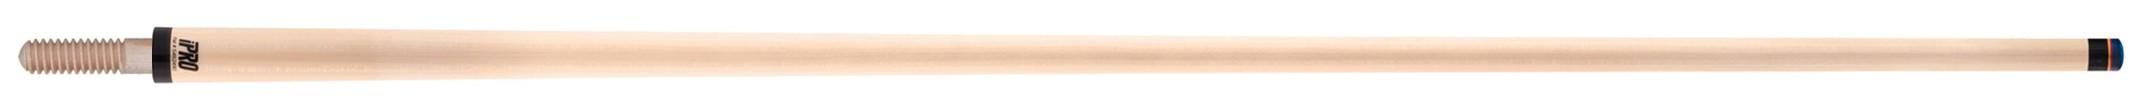 McDermott carom shaft IPro 11,75mm Woodjoint